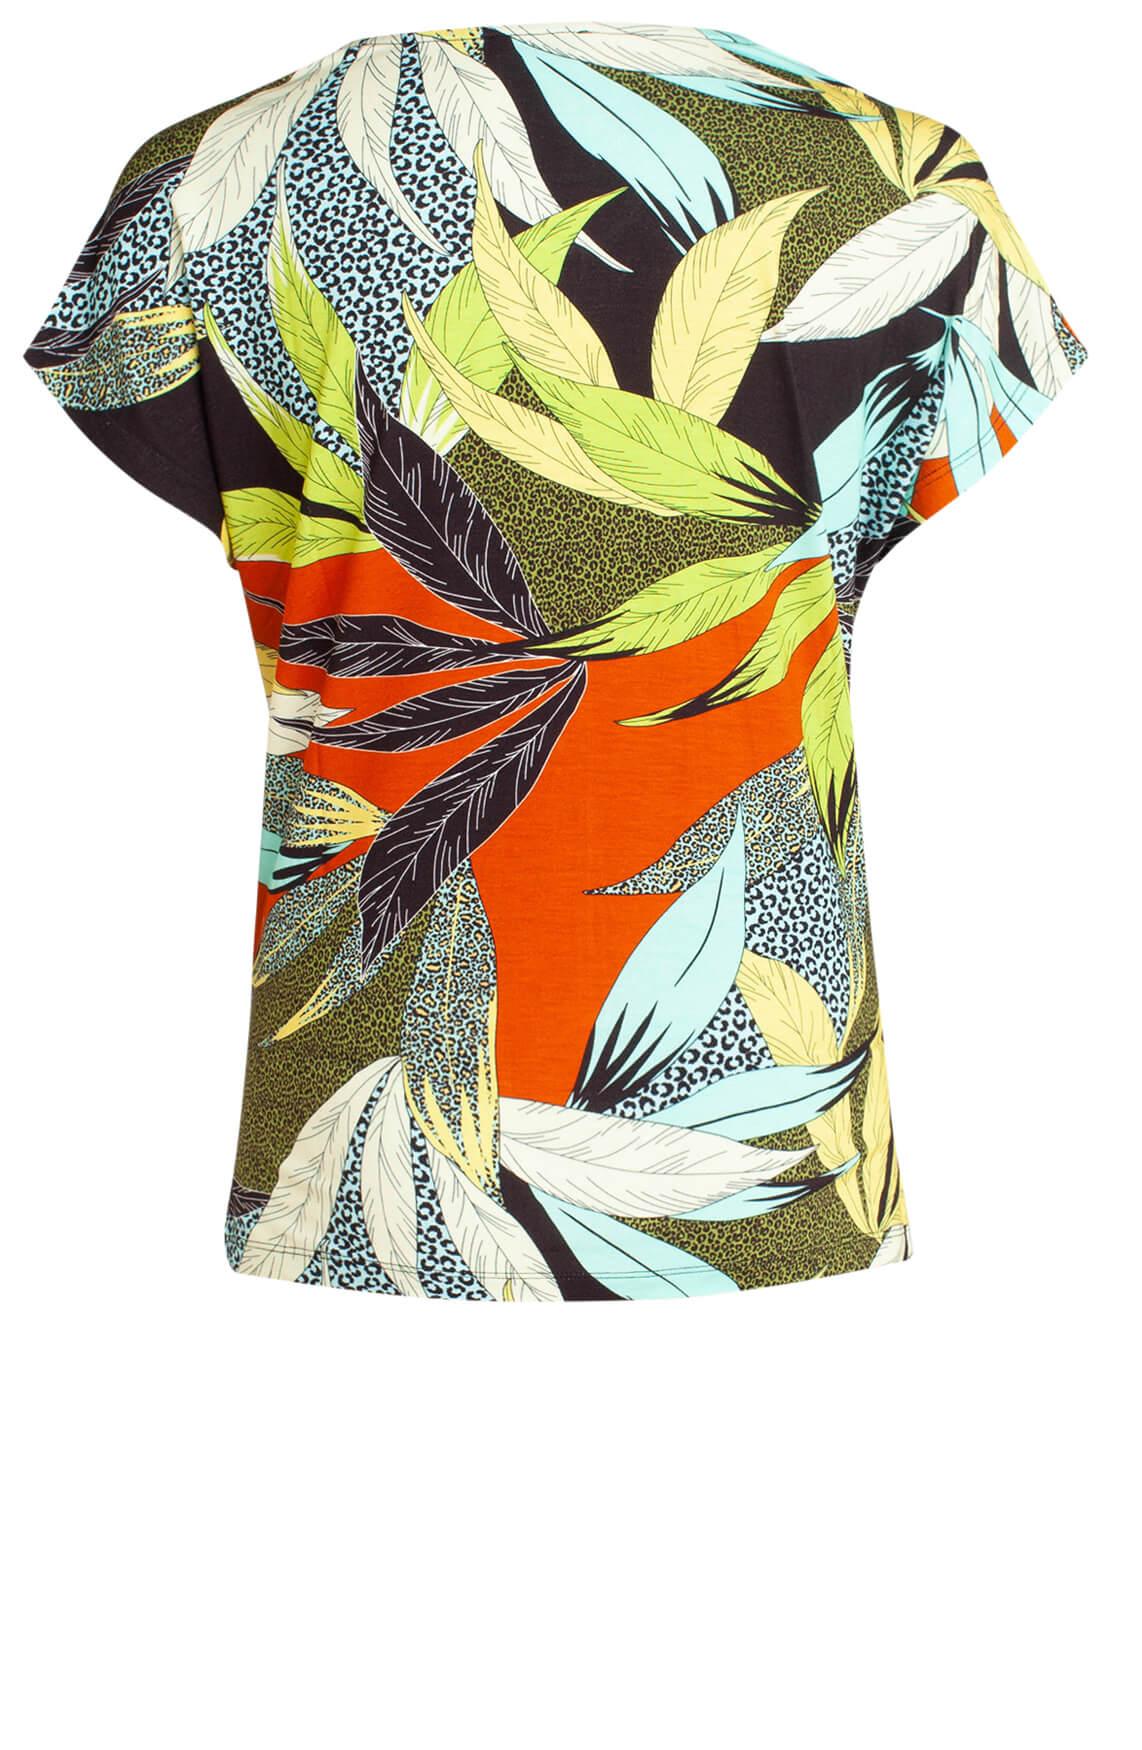 Anna Dames Shirt met kleurrijke print Bruin